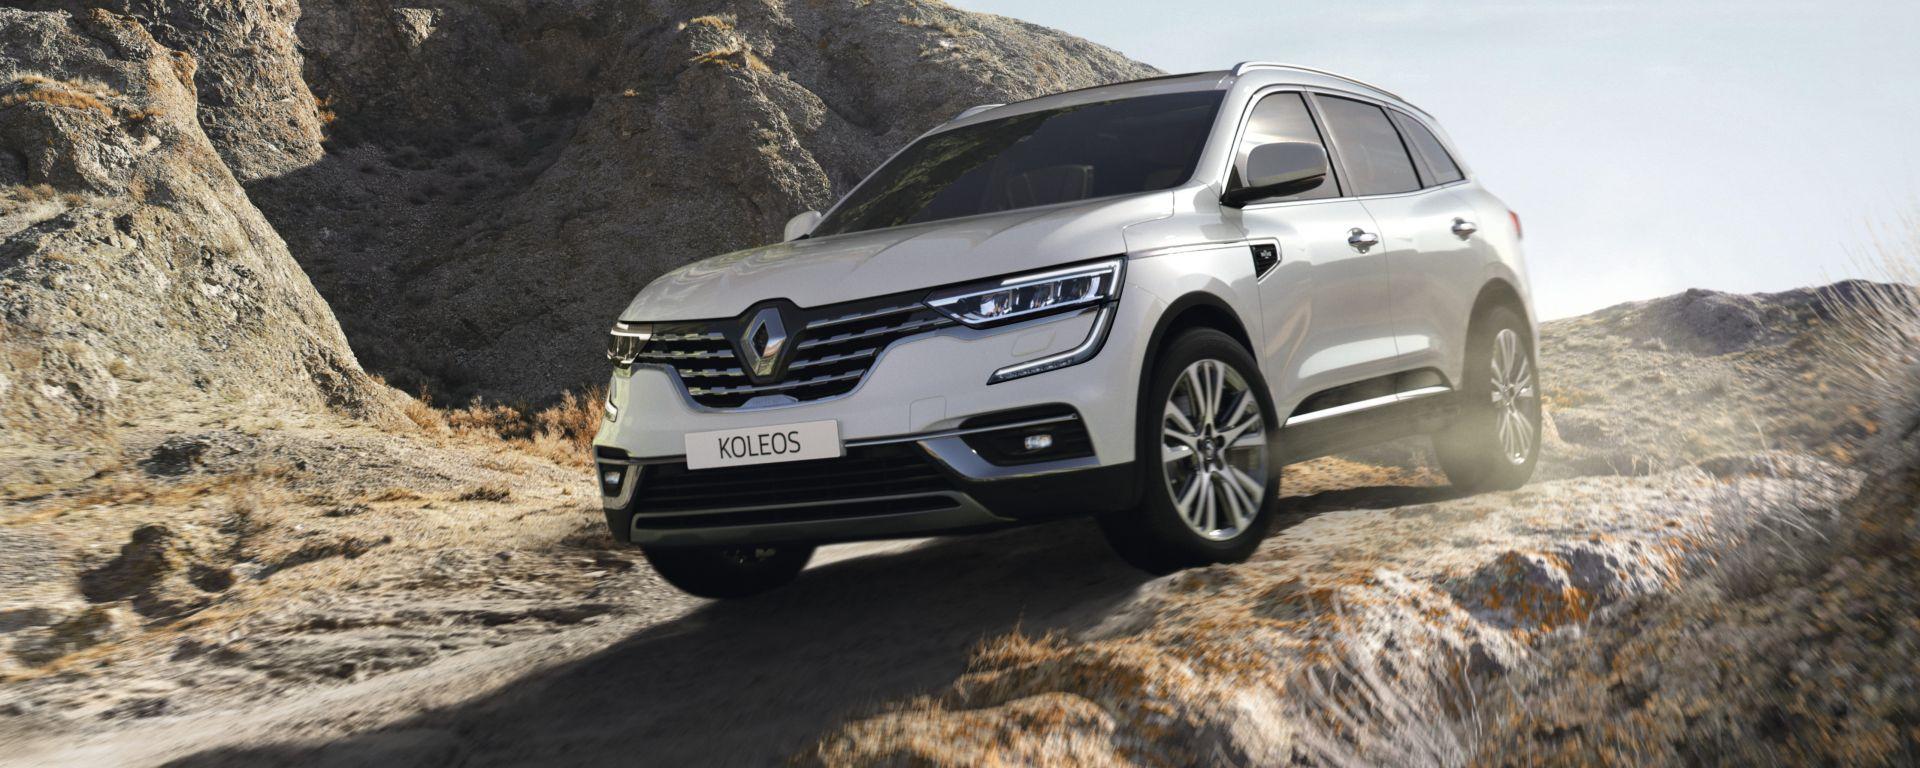 Renault Koleos 2021: il restyling del SUV francese